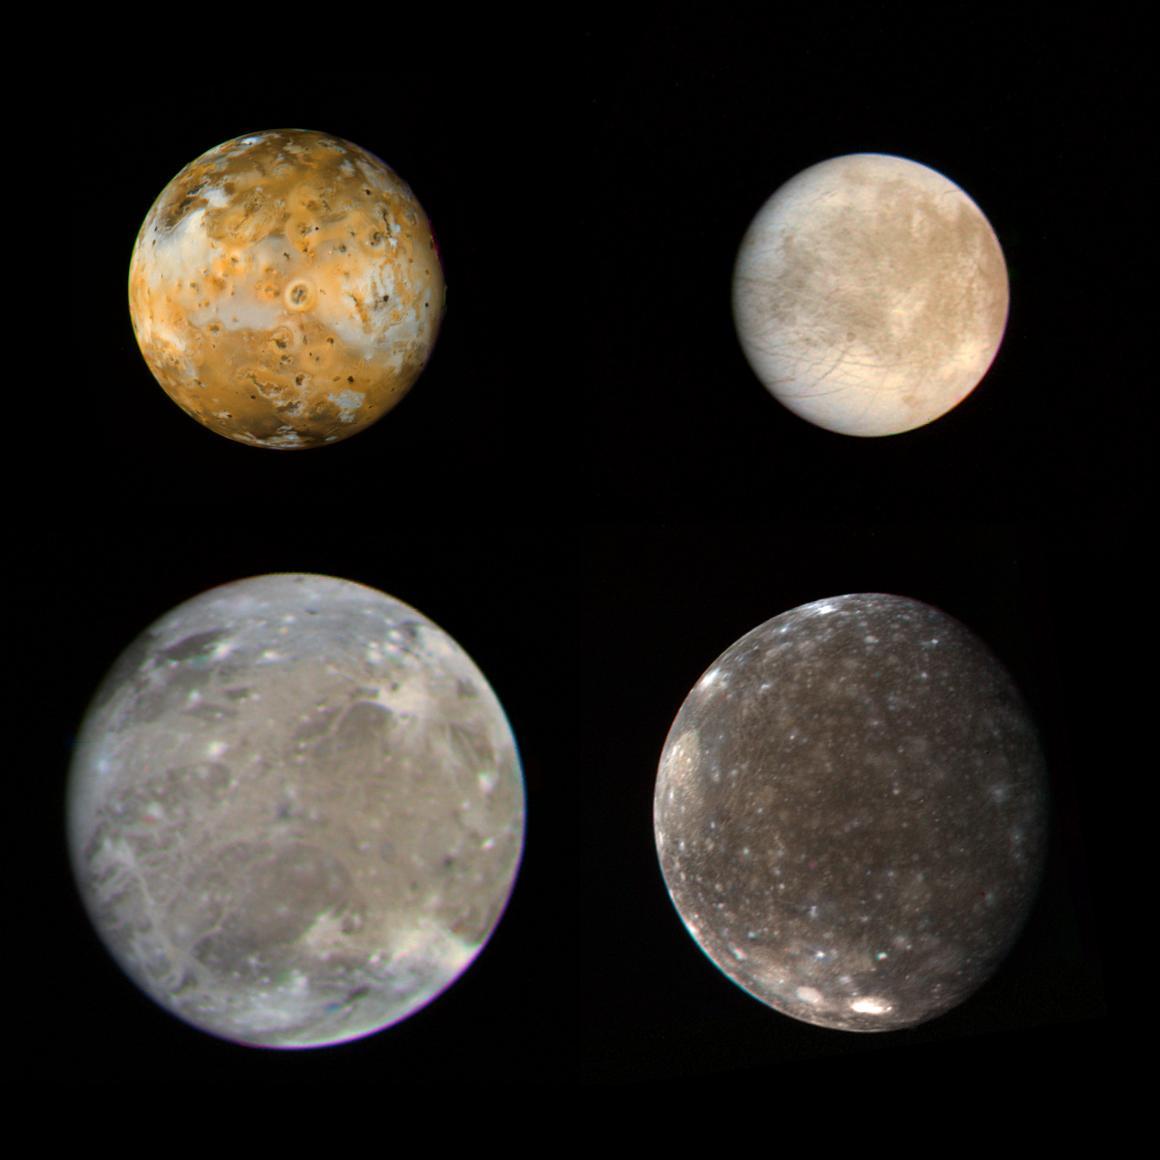 galileo moon nasa - photo #16